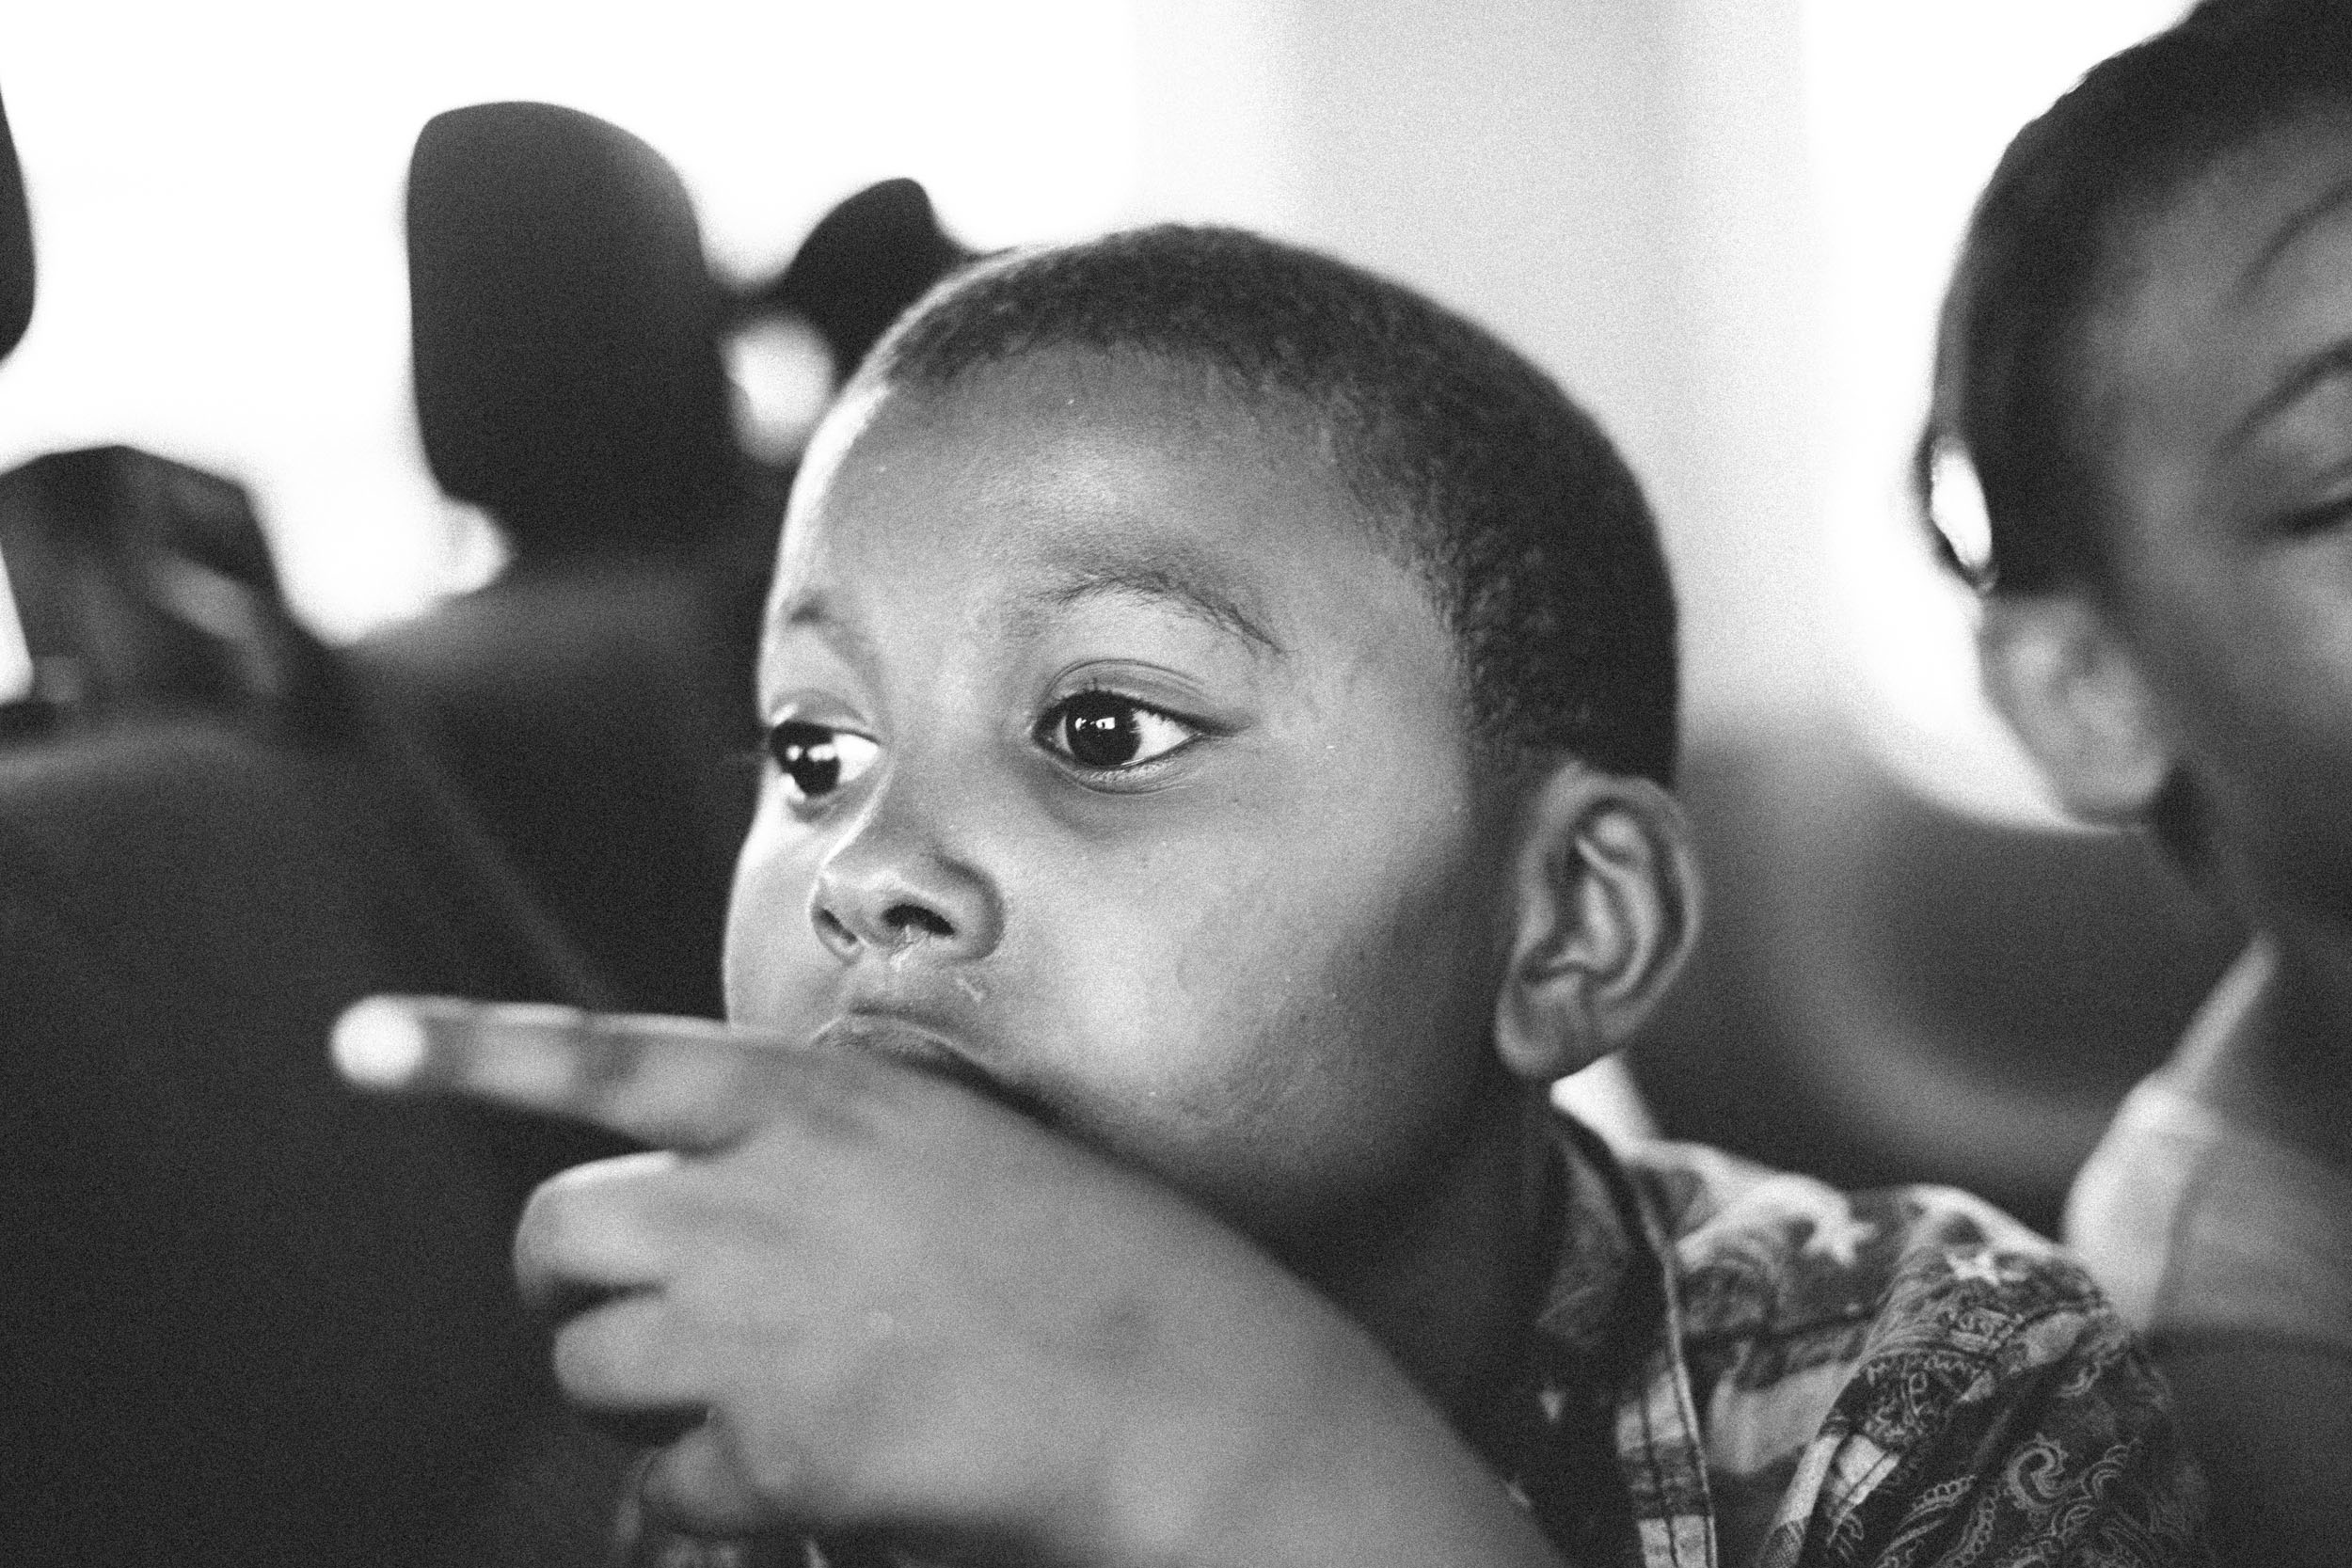 jimmy-rowalt-portrait-photography-new-orleans-kid-001.jpg